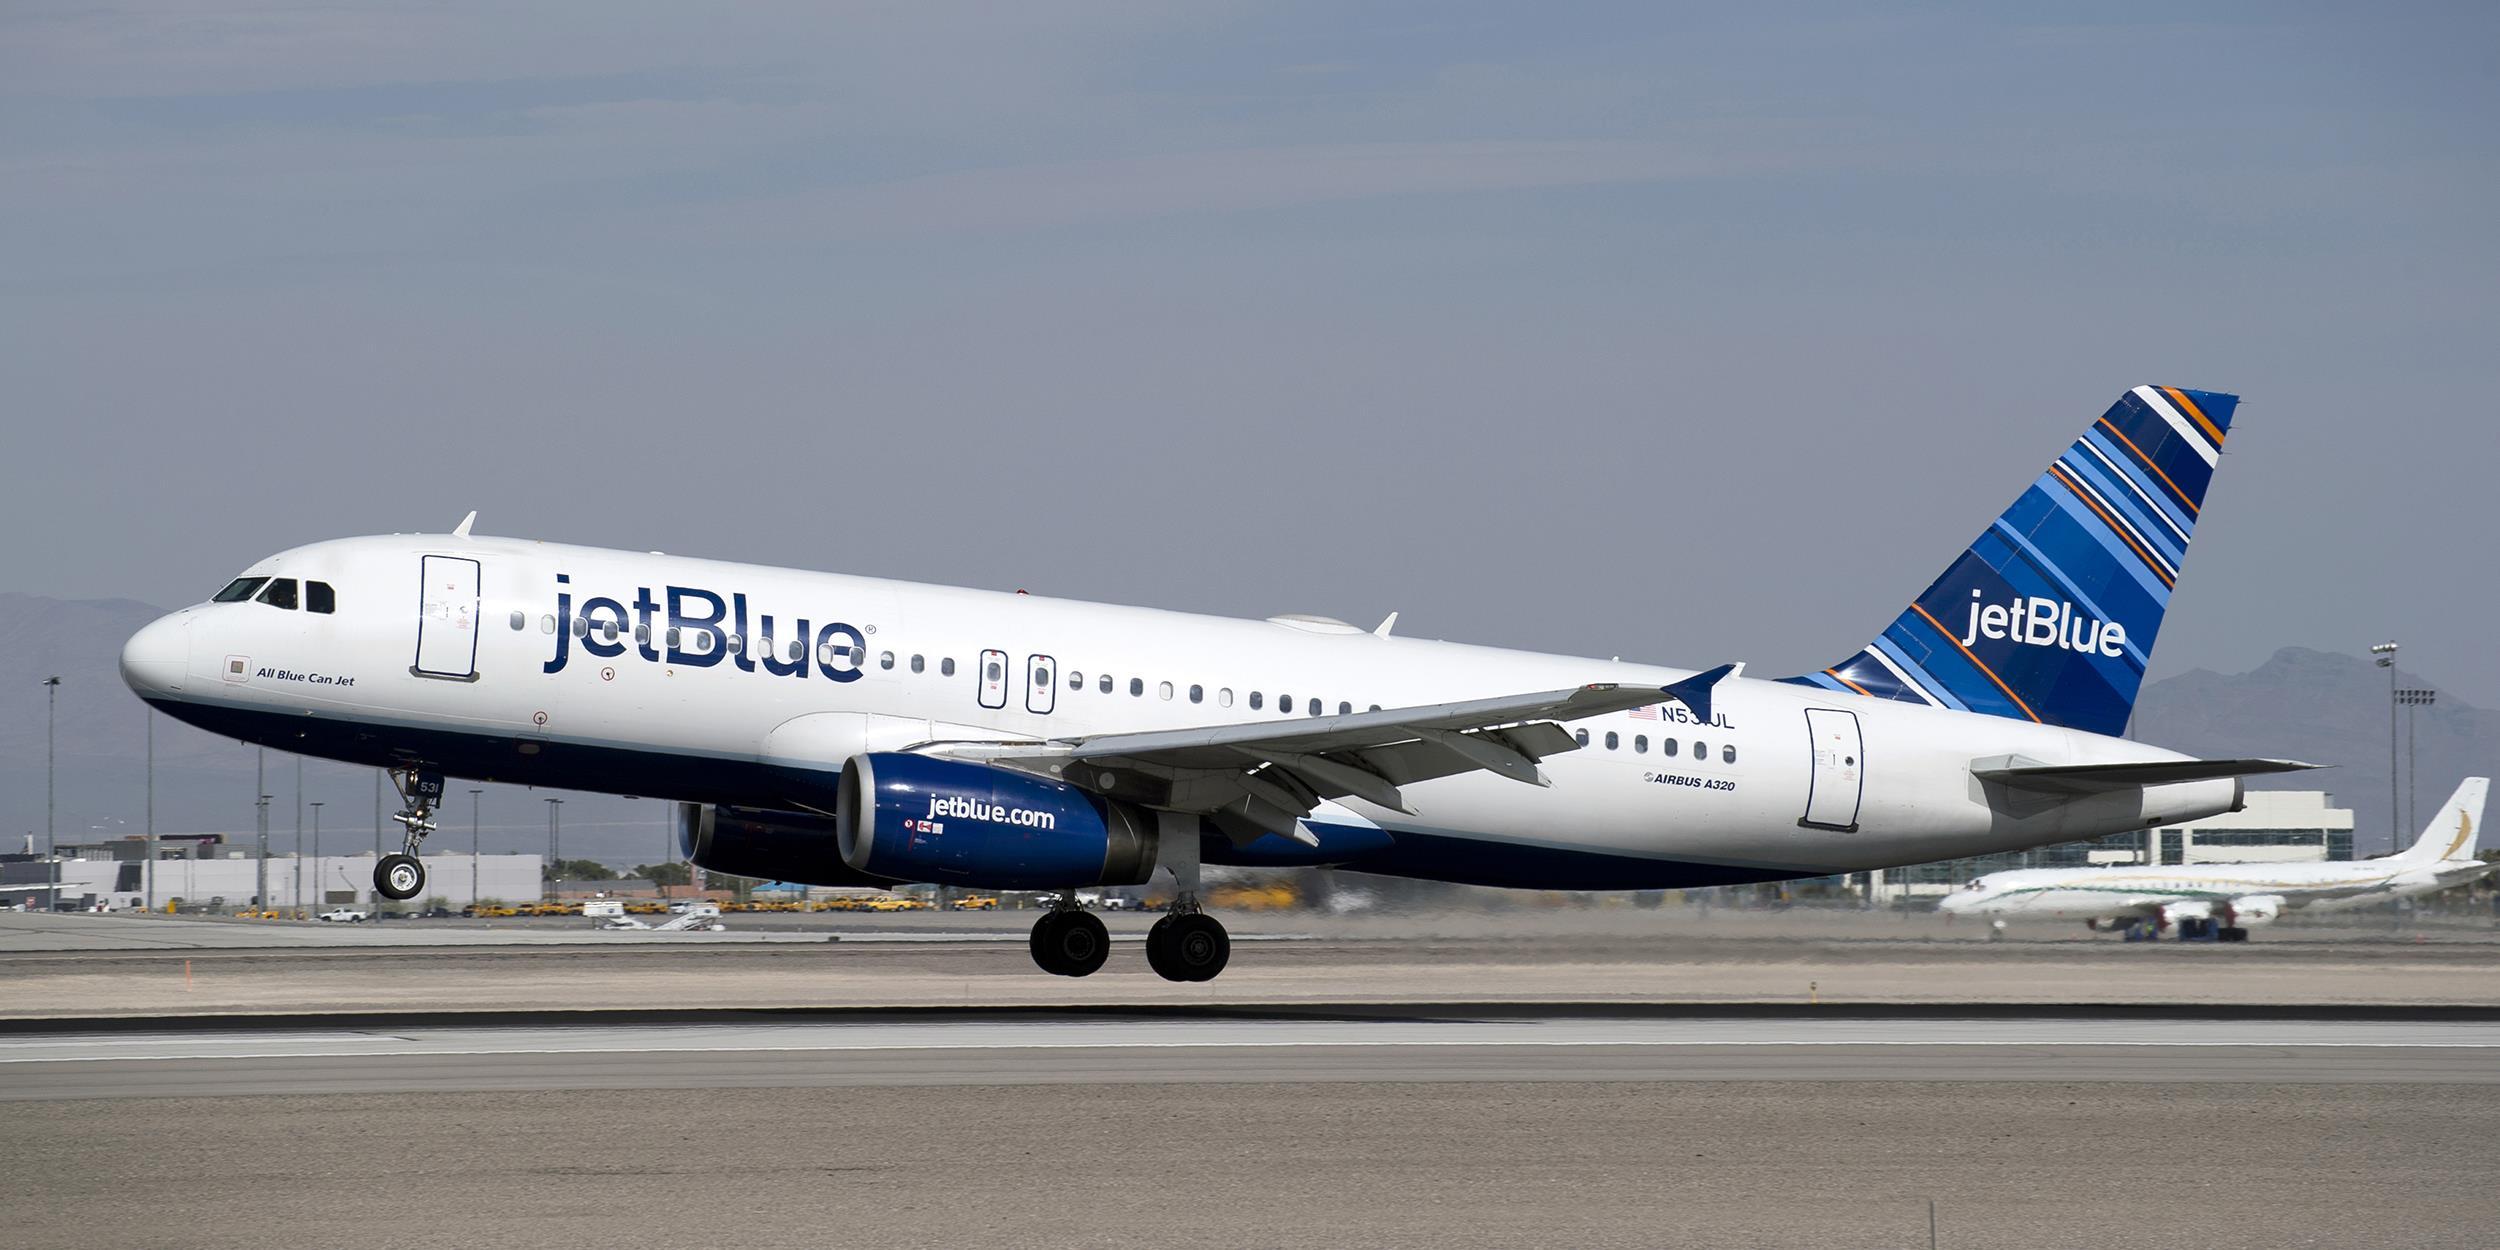 JetBlue to add bag fees, cut legroom - TODAY.com